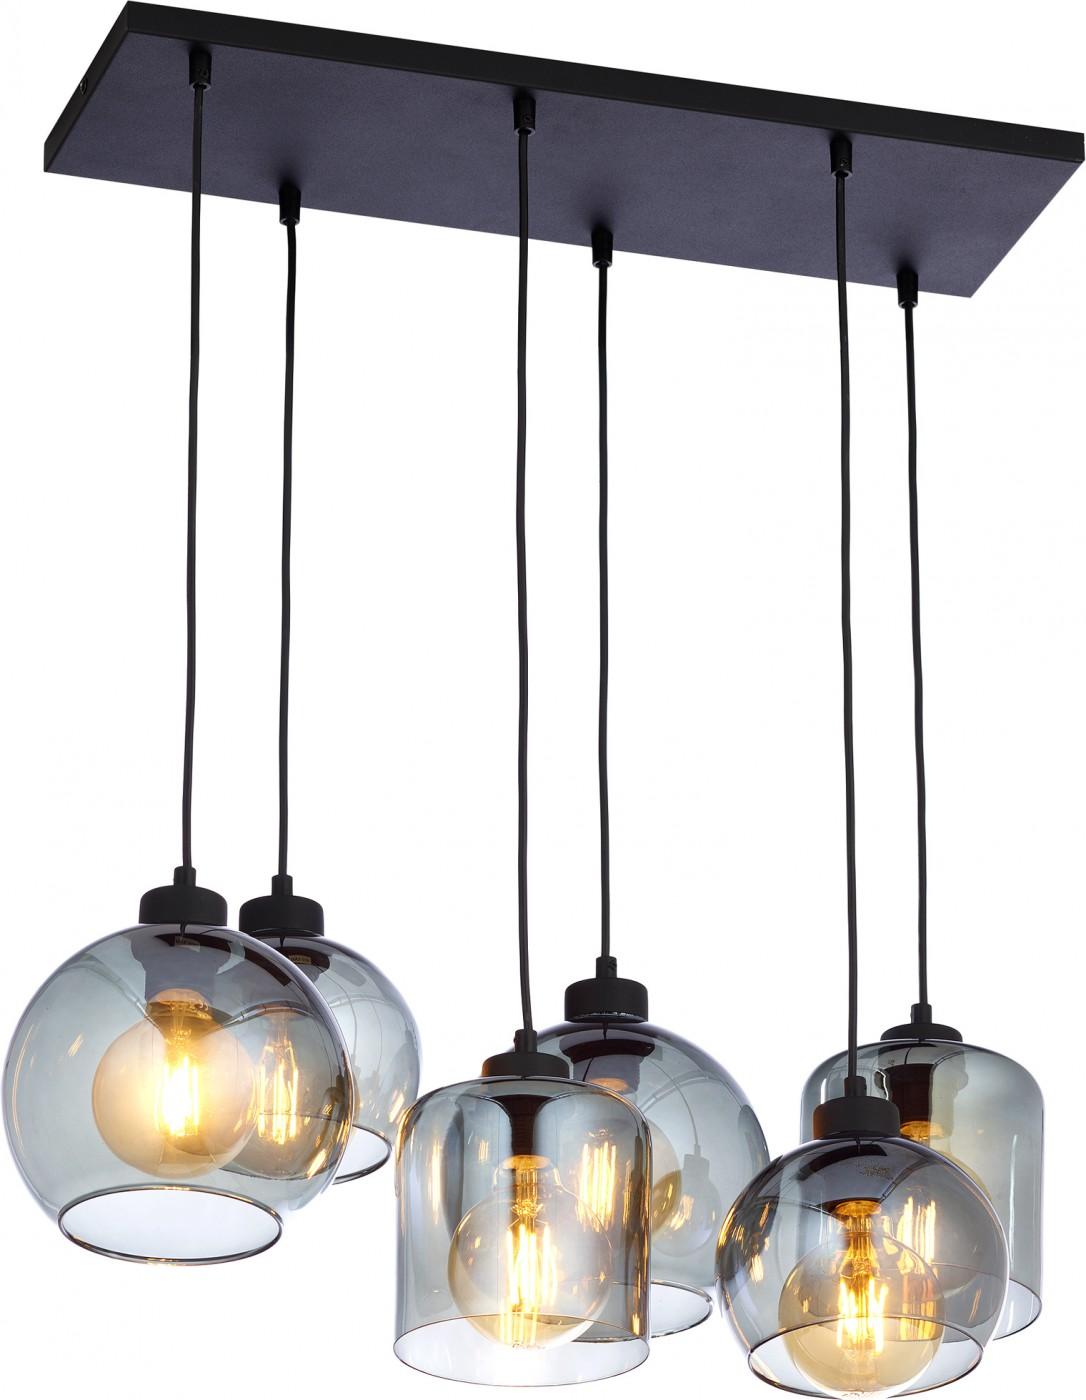 TK Lighting TK-2554 Sintra függeszték